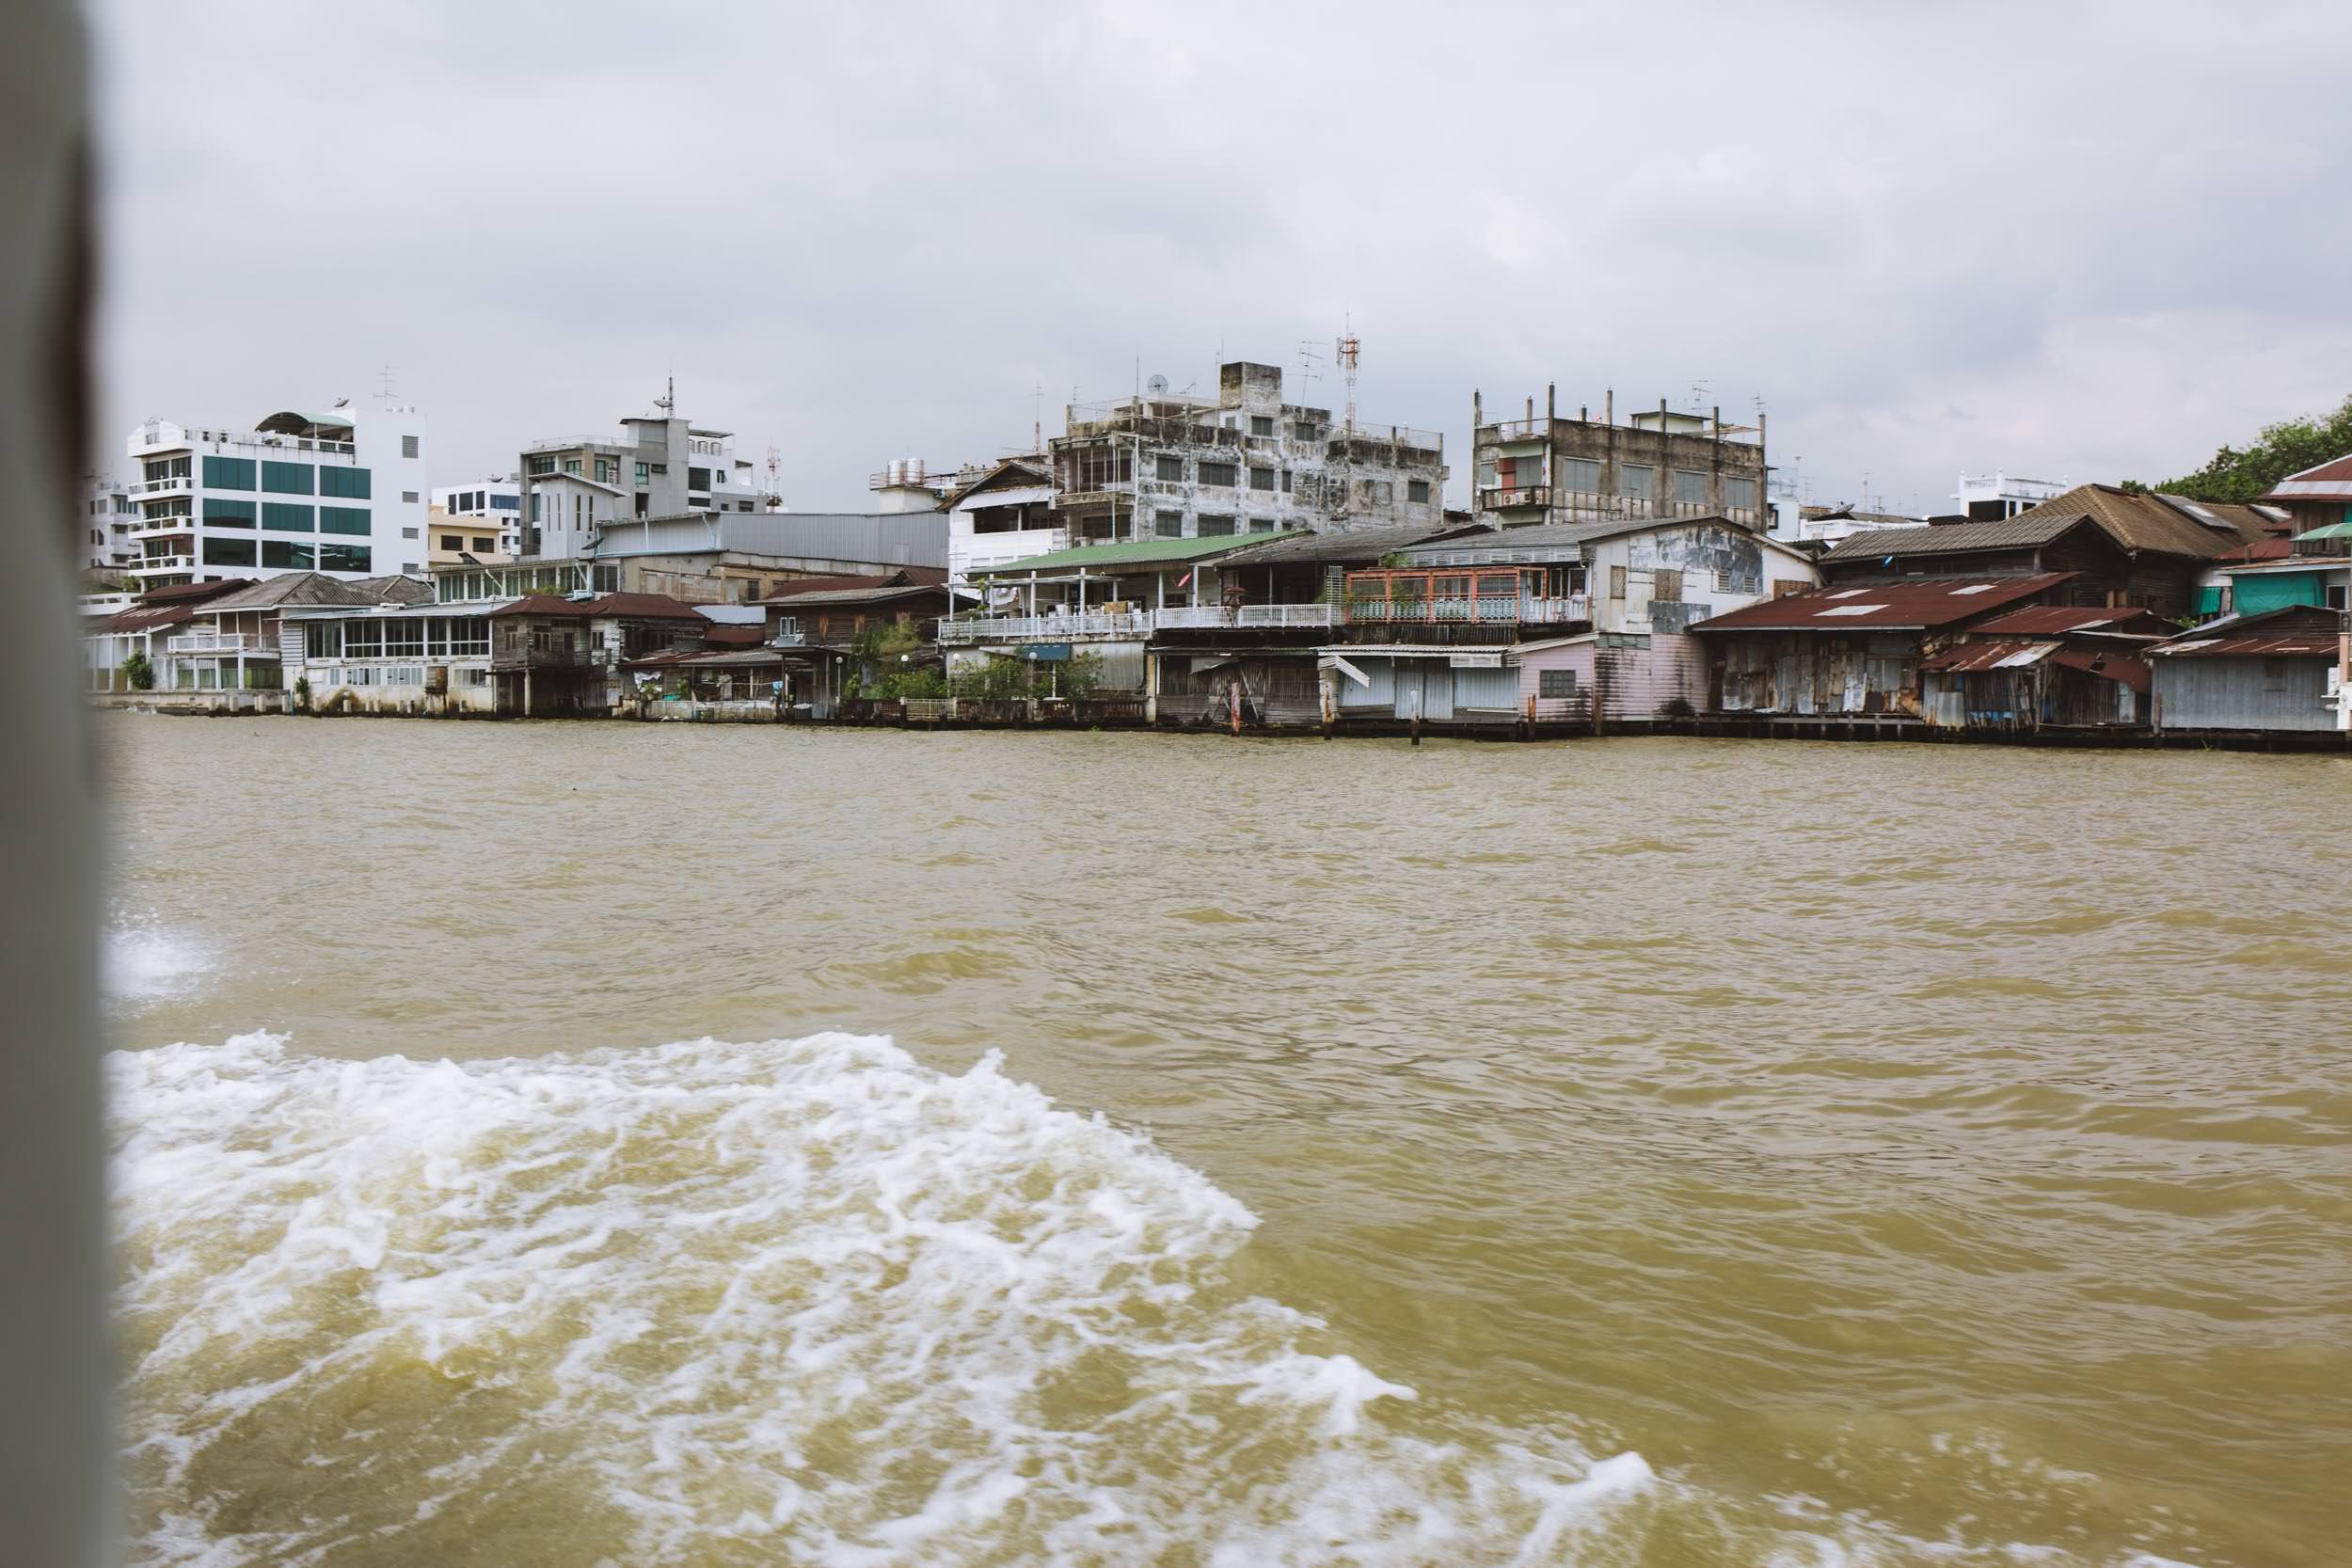 thailand_budget_travel_019.jpg